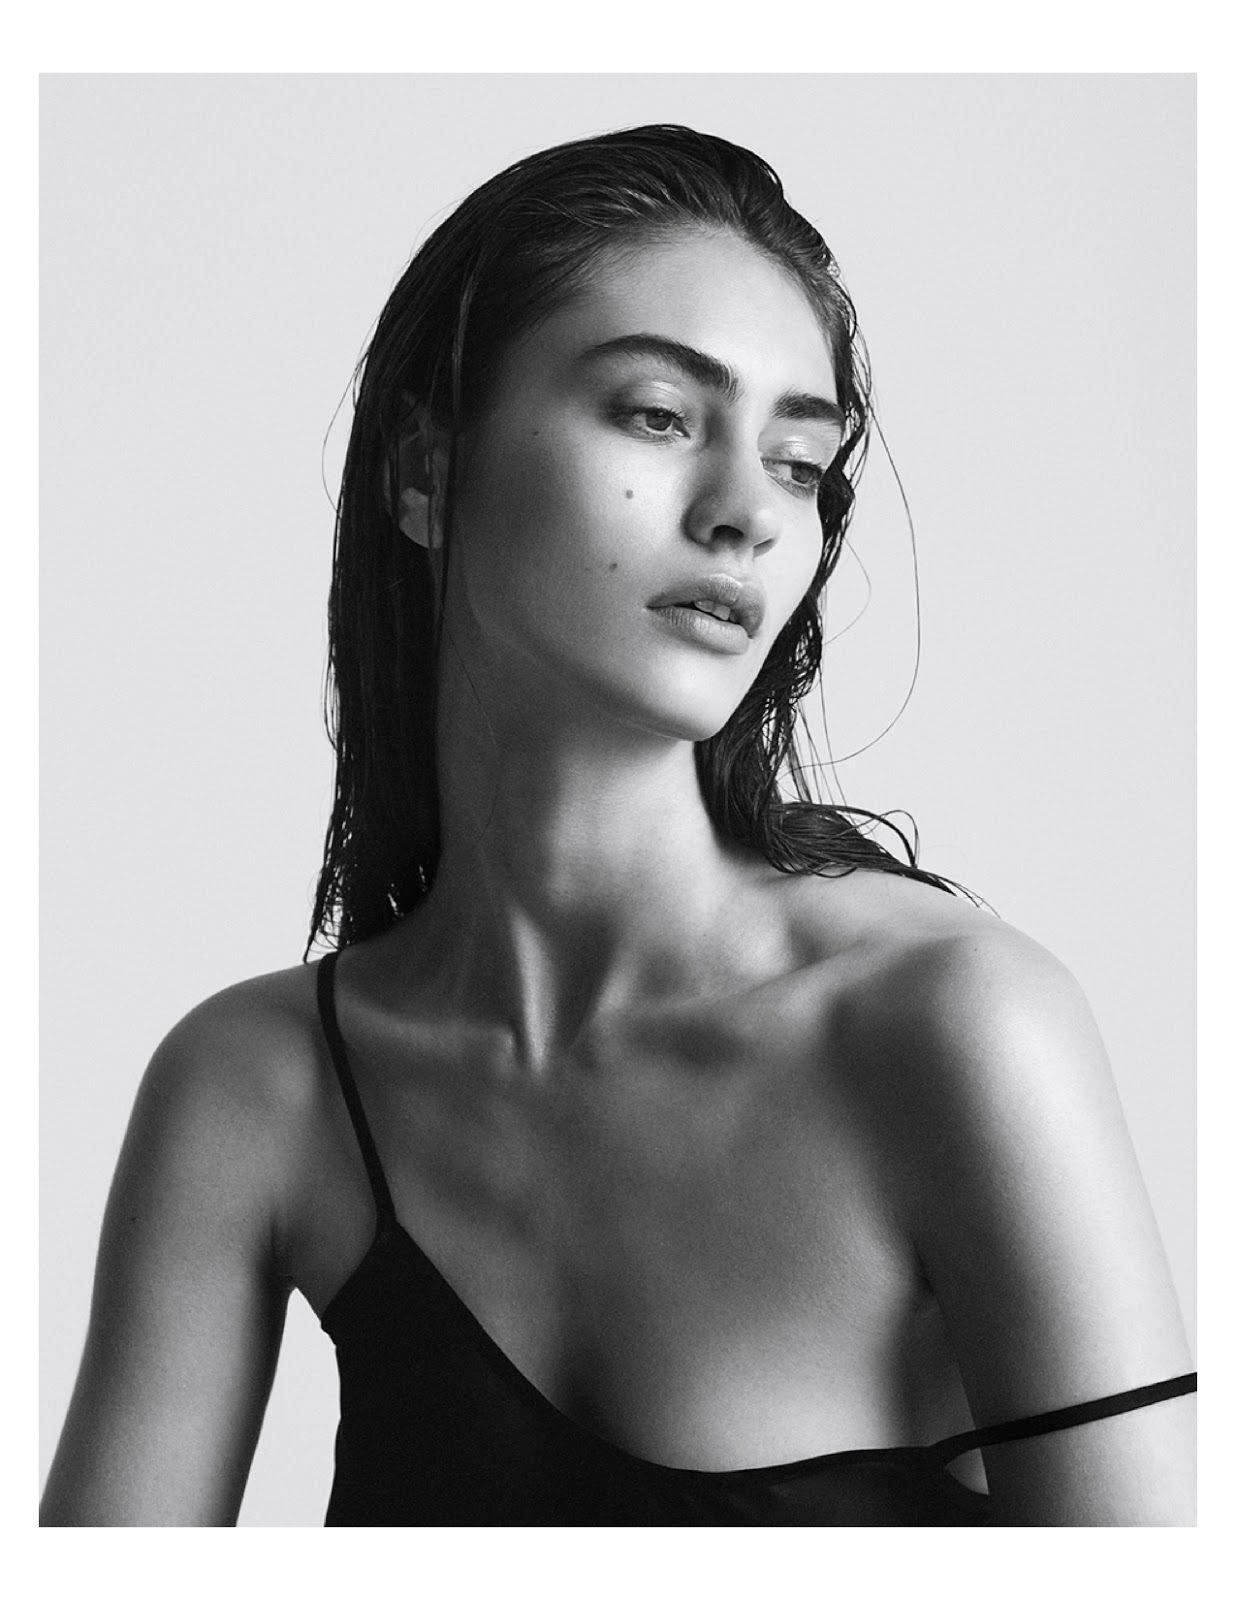 Cleavage Inge de Bruijn nudes (52 foto and video), Topless, Leaked, Boobs, bra 2019